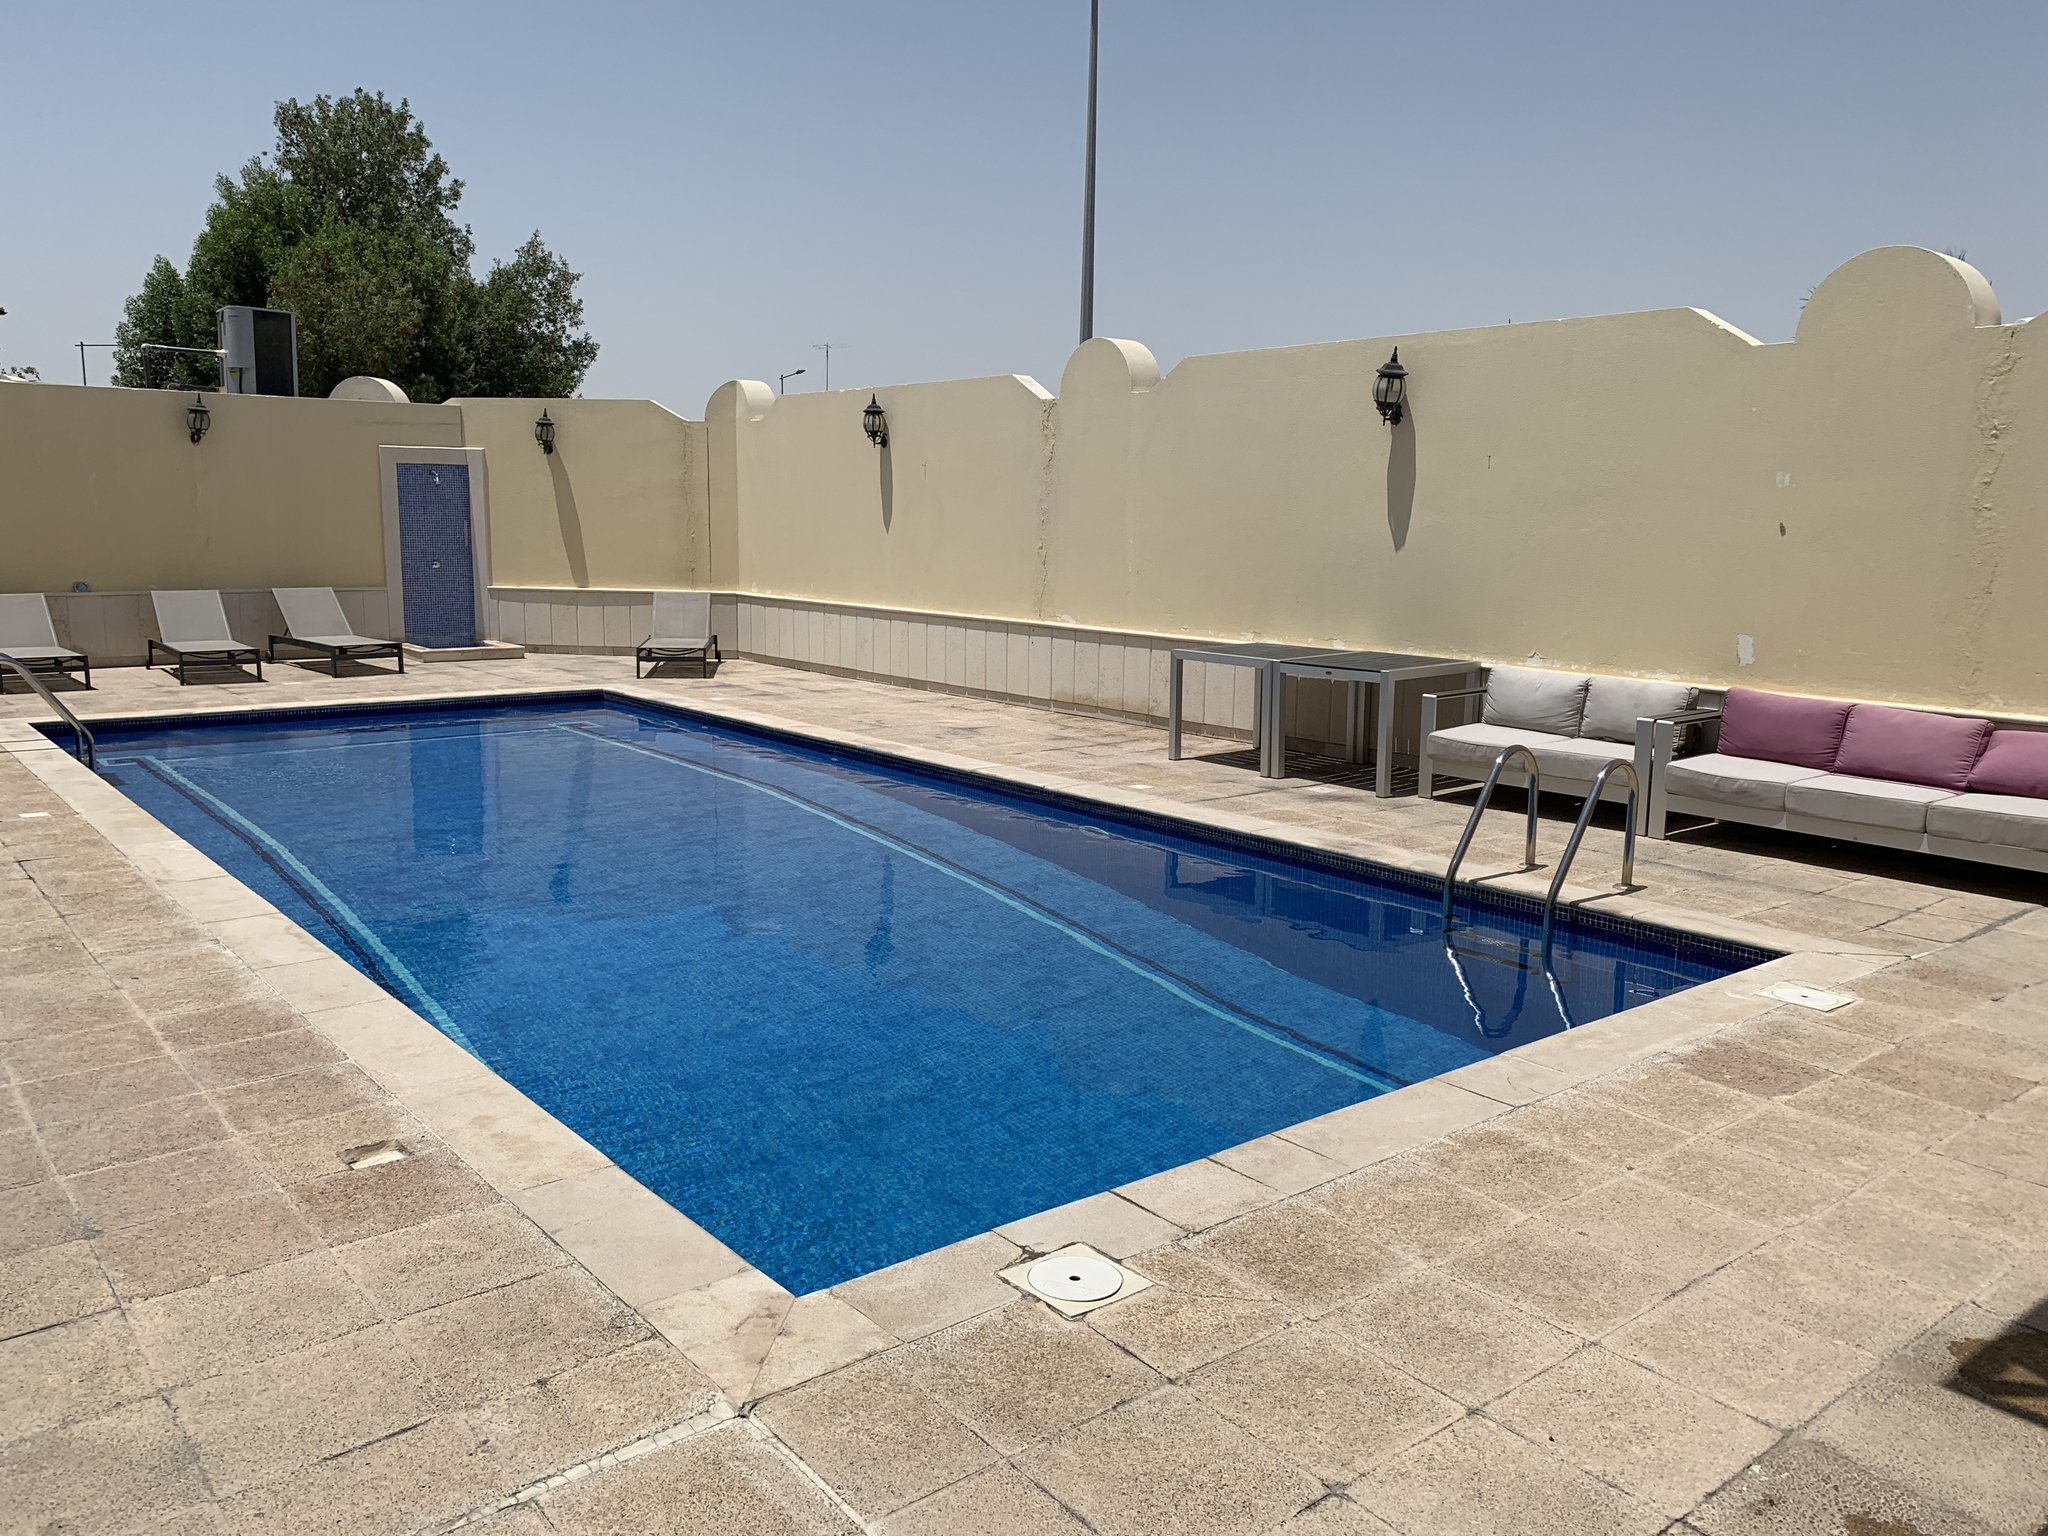 4 Bedroom Villa for rent next to Salwa Road